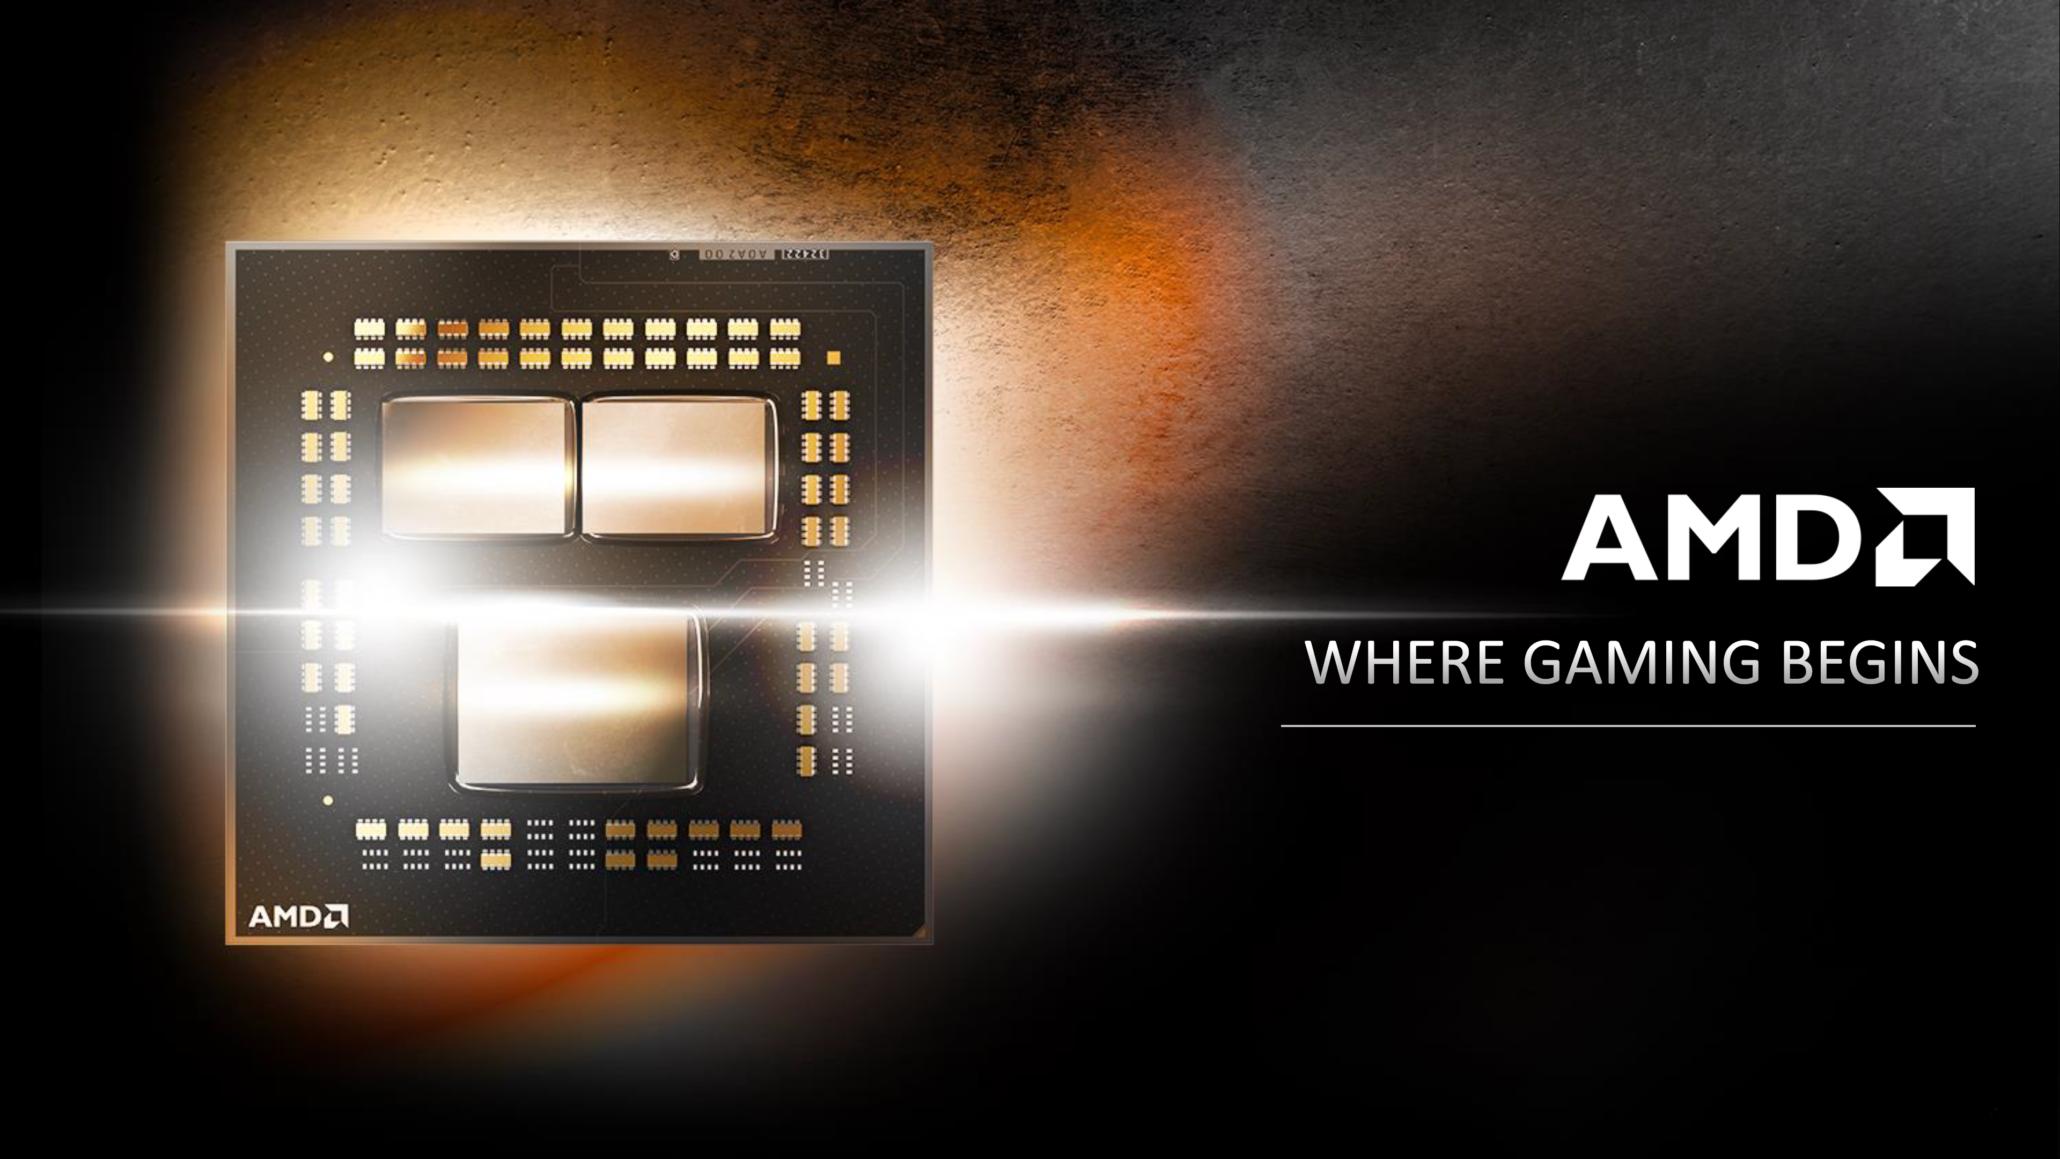 AMD Ryzen 5 5600X 6 Core Dikabarkan Menawarkan Gaming Performance Lebih Baik Dibanding Intel Core i7-10700 8 Core CPU